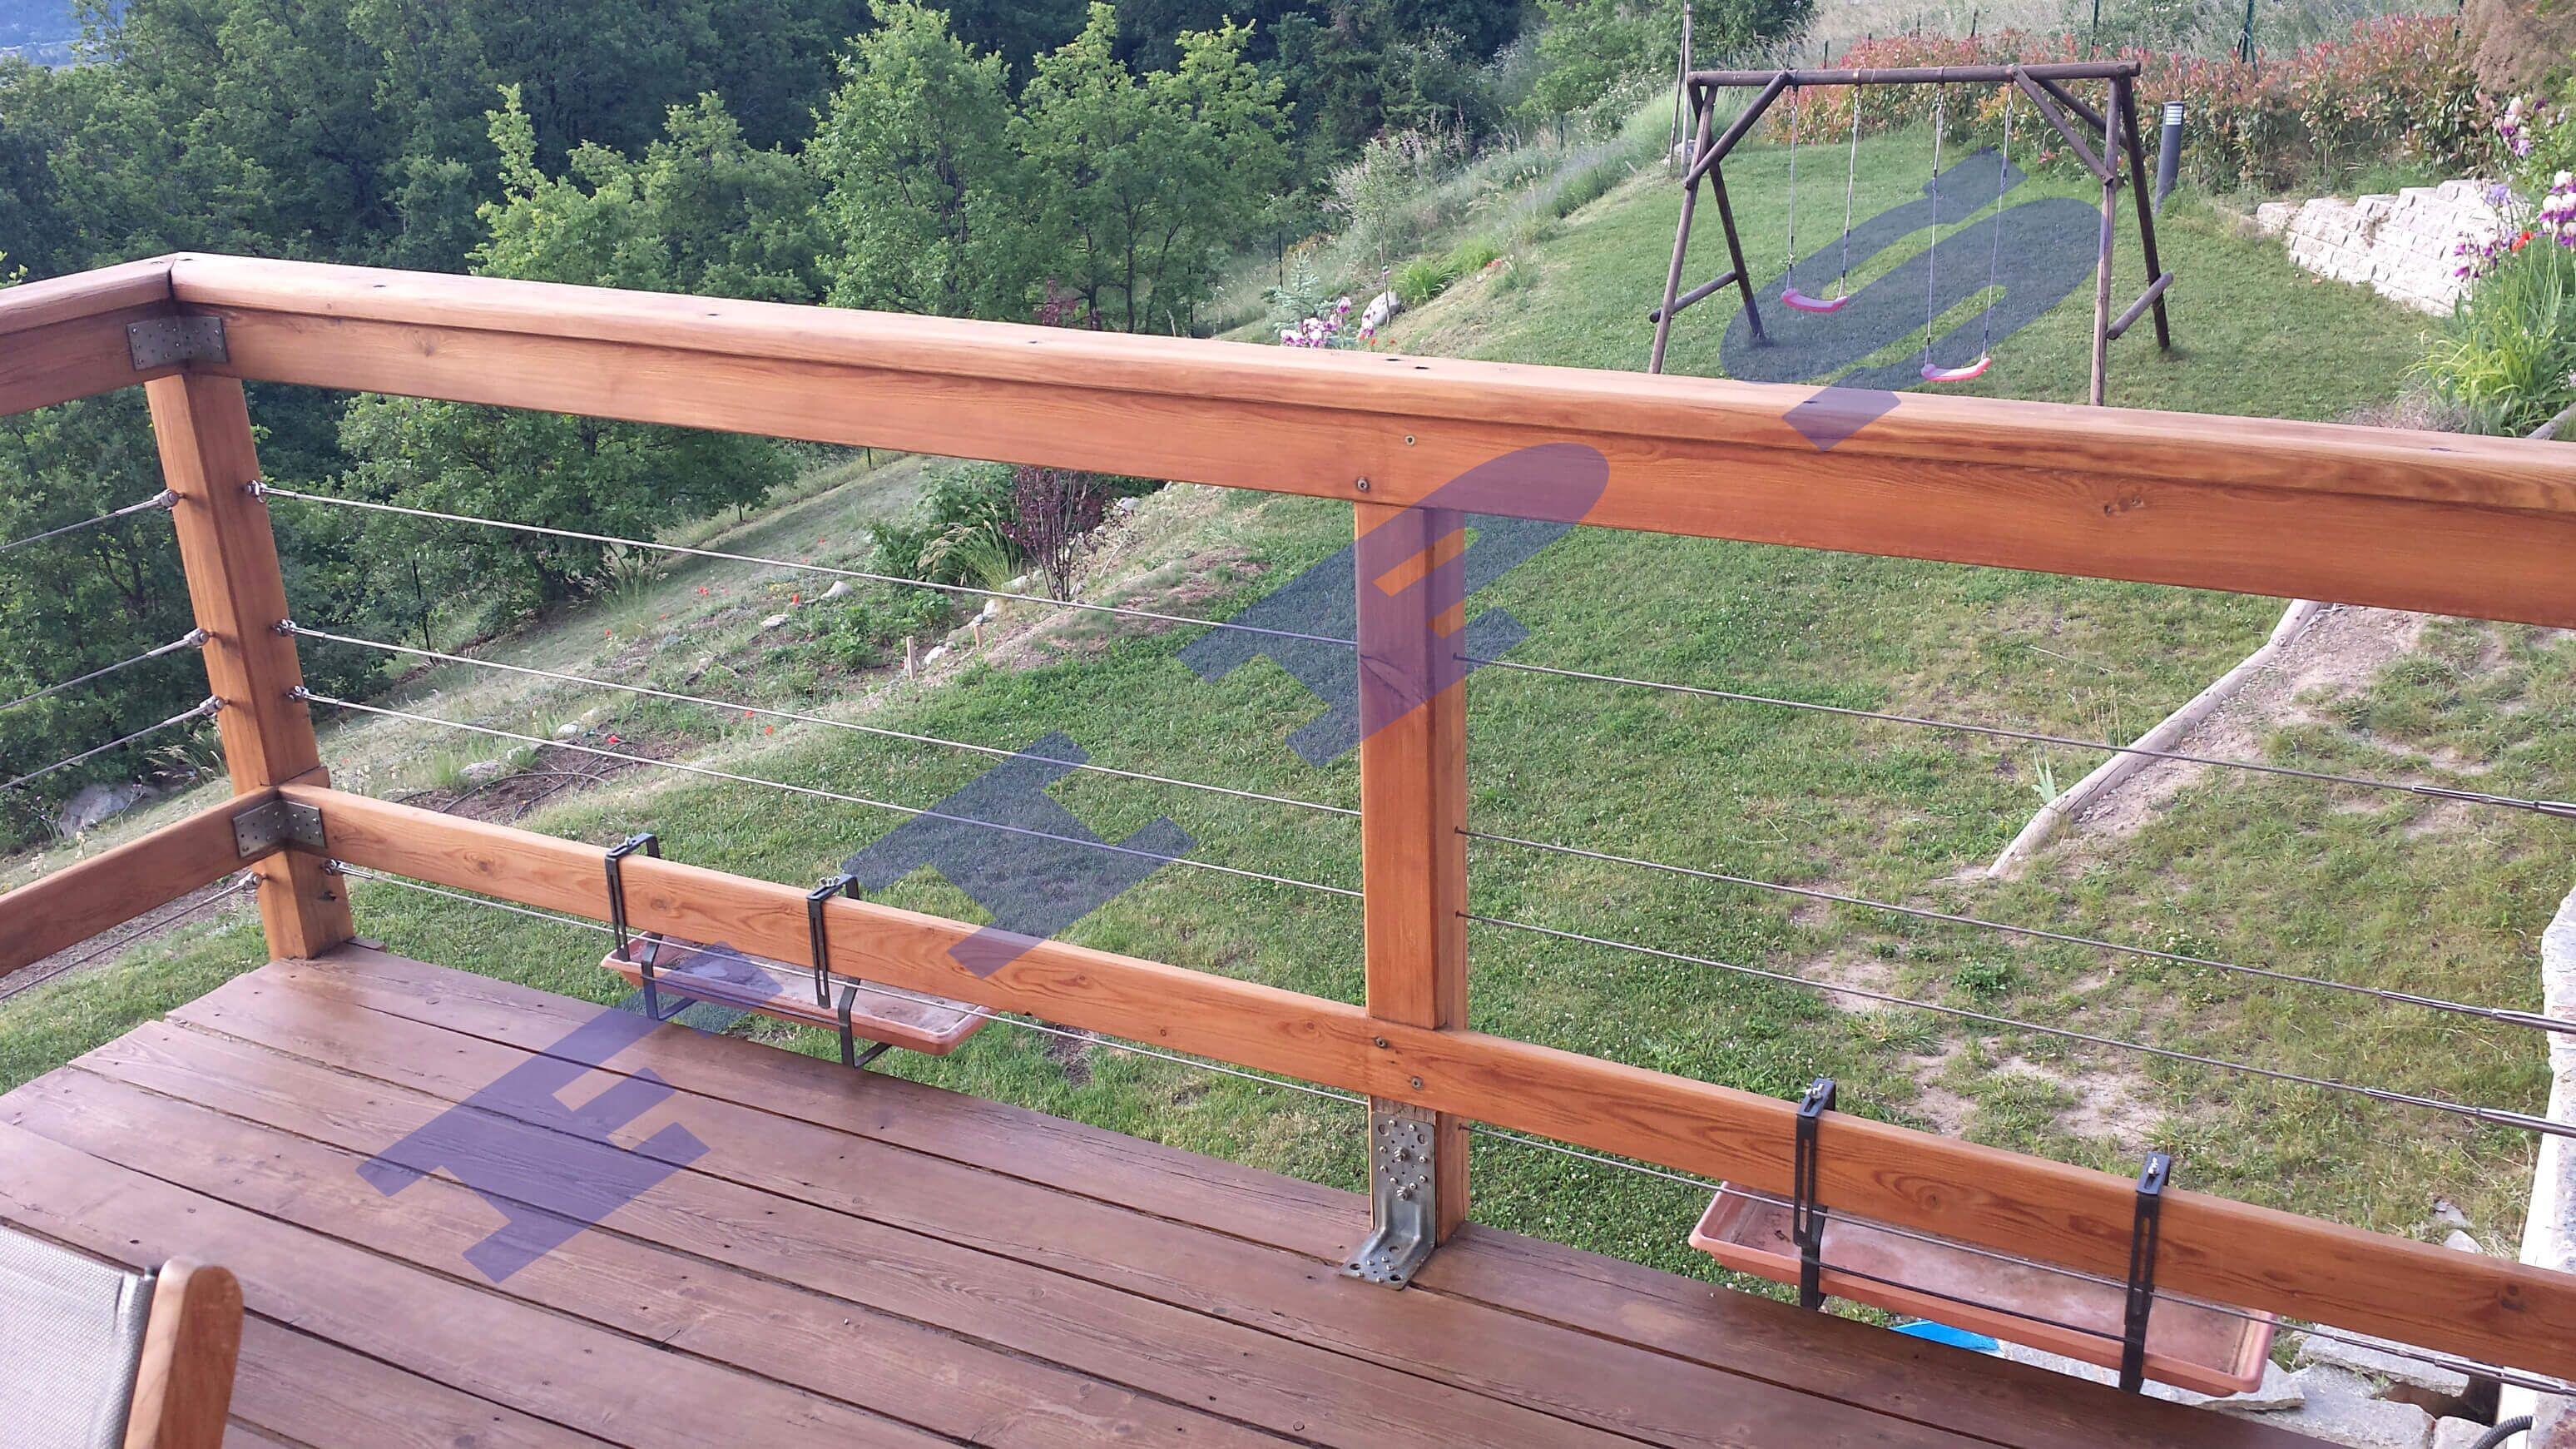 rambarde bois terrasse exterieur recherche google am nagement ext rieur outdoor decor. Black Bedroom Furniture Sets. Home Design Ideas